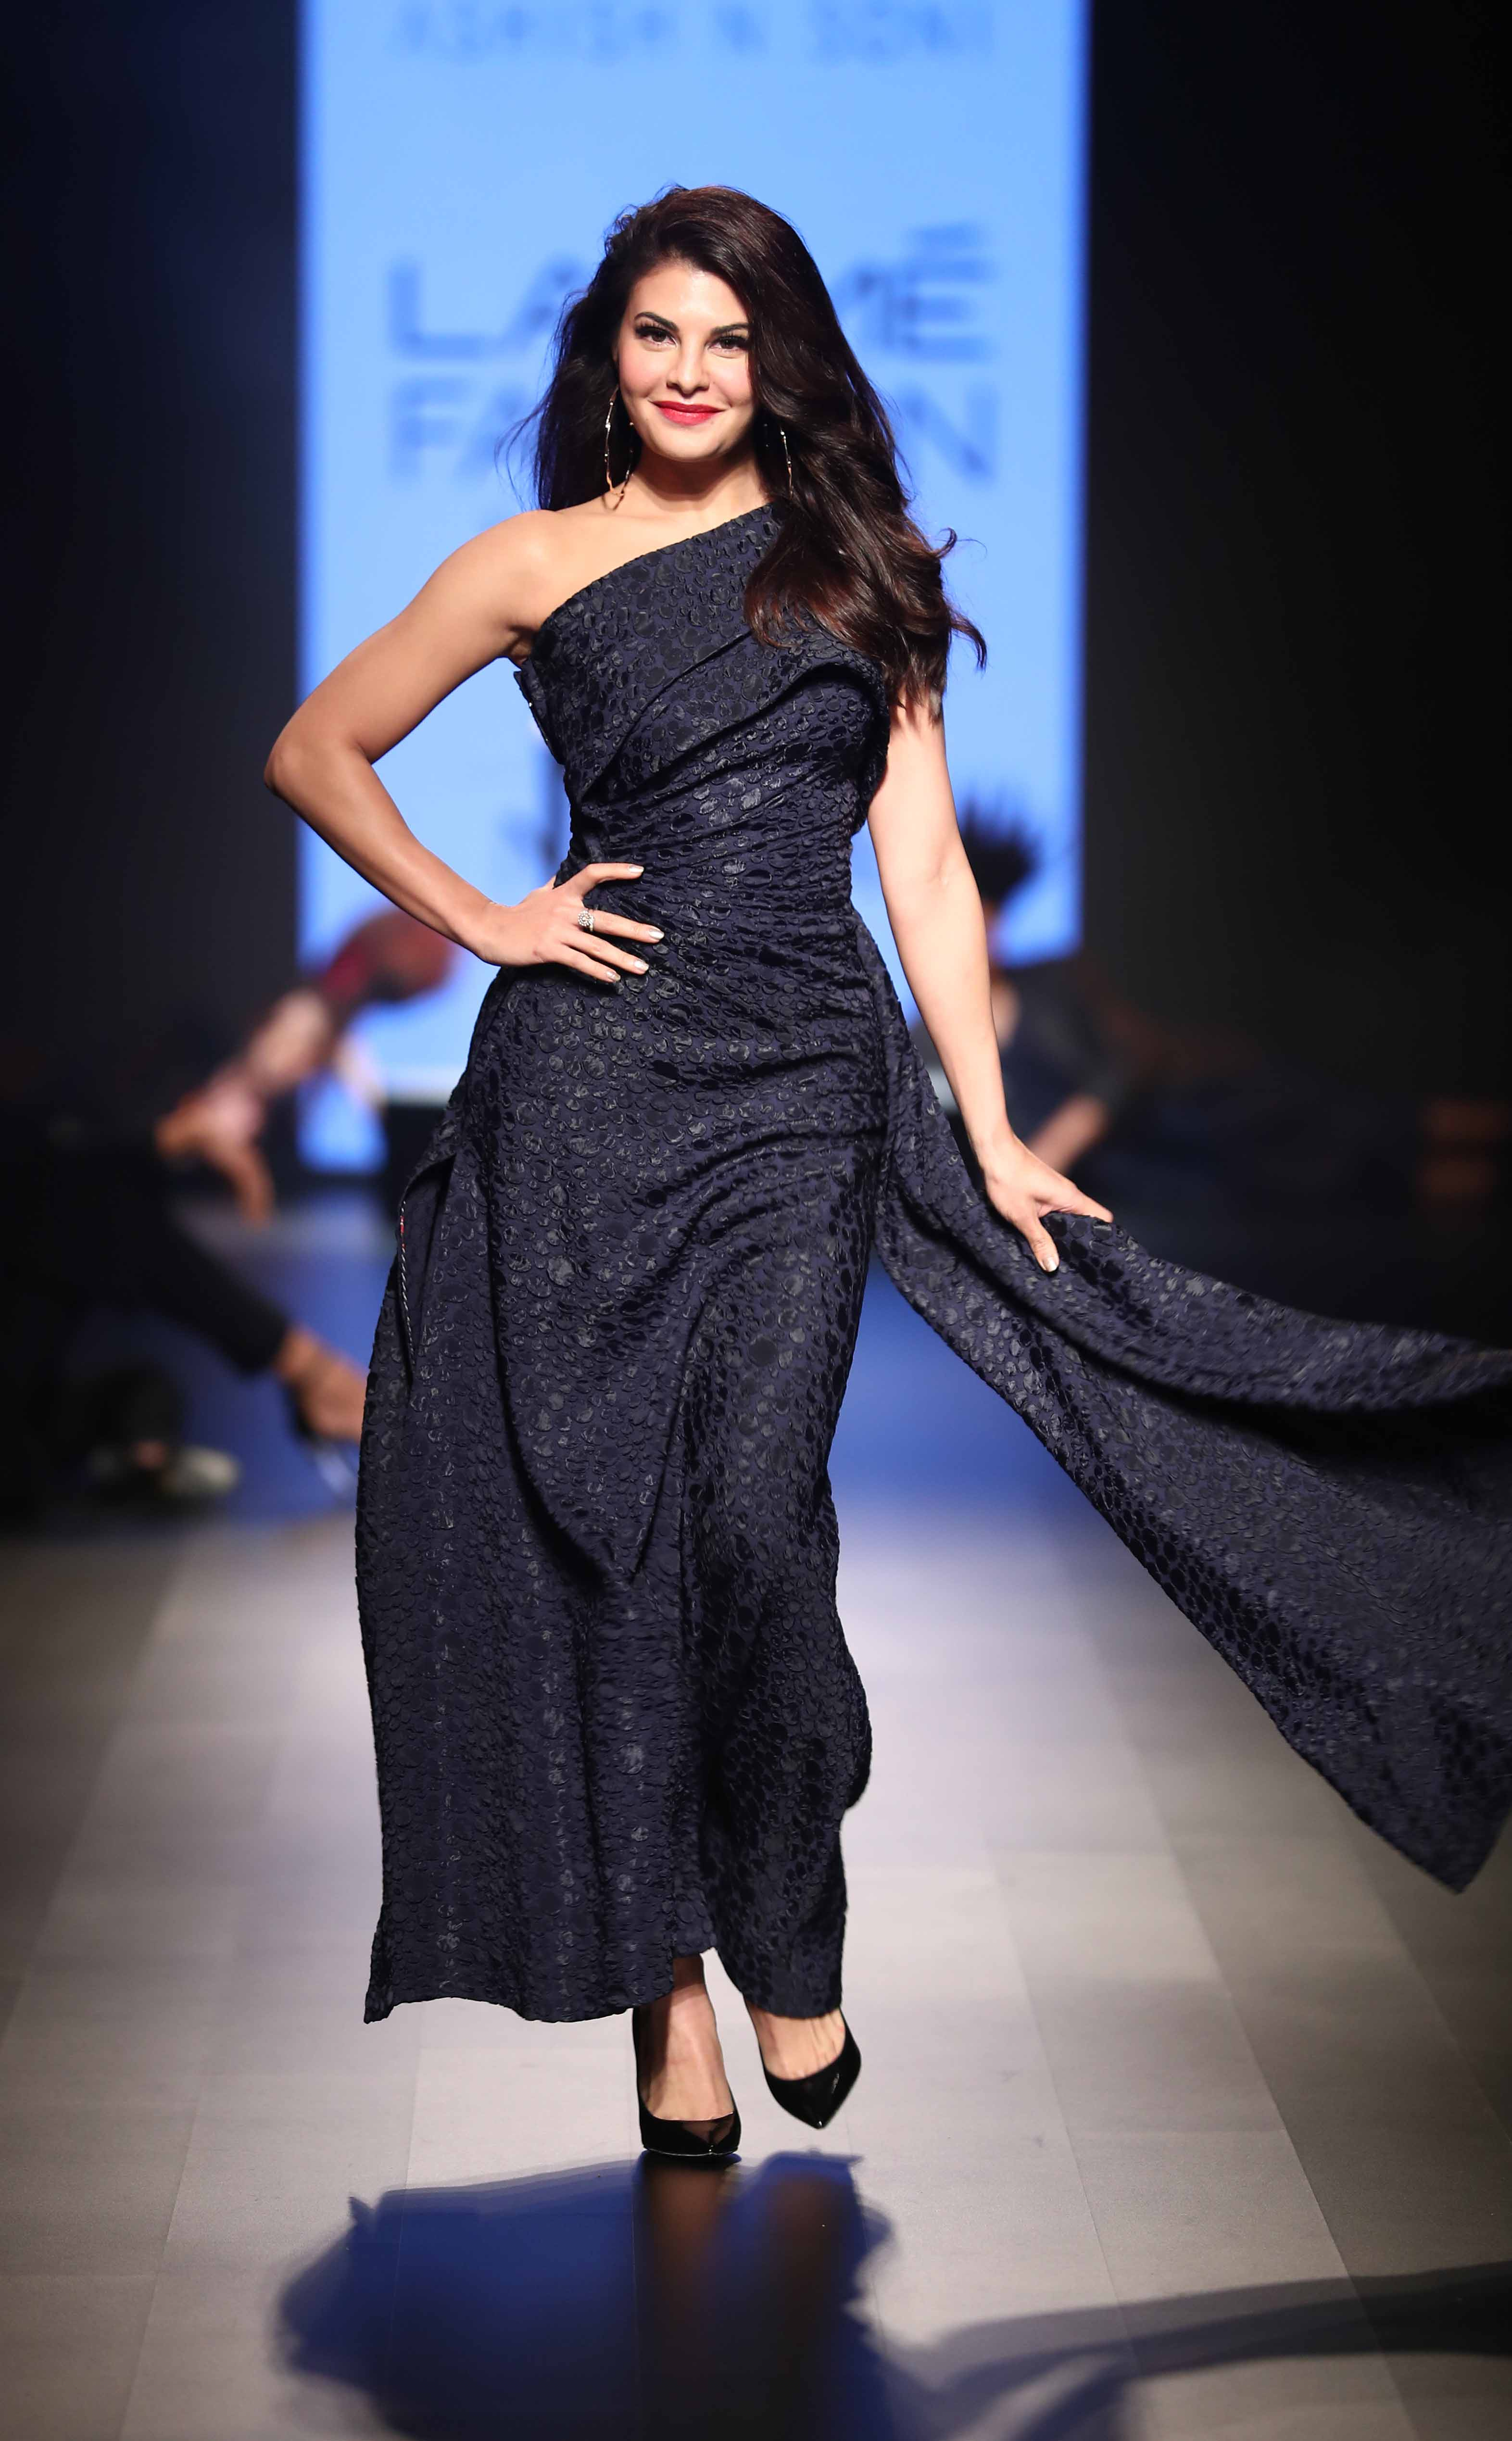 TRESemme Brand Ambassador Jacqueline Fernandez walks for Ashish Soni at Lakme Fashion Week WF18